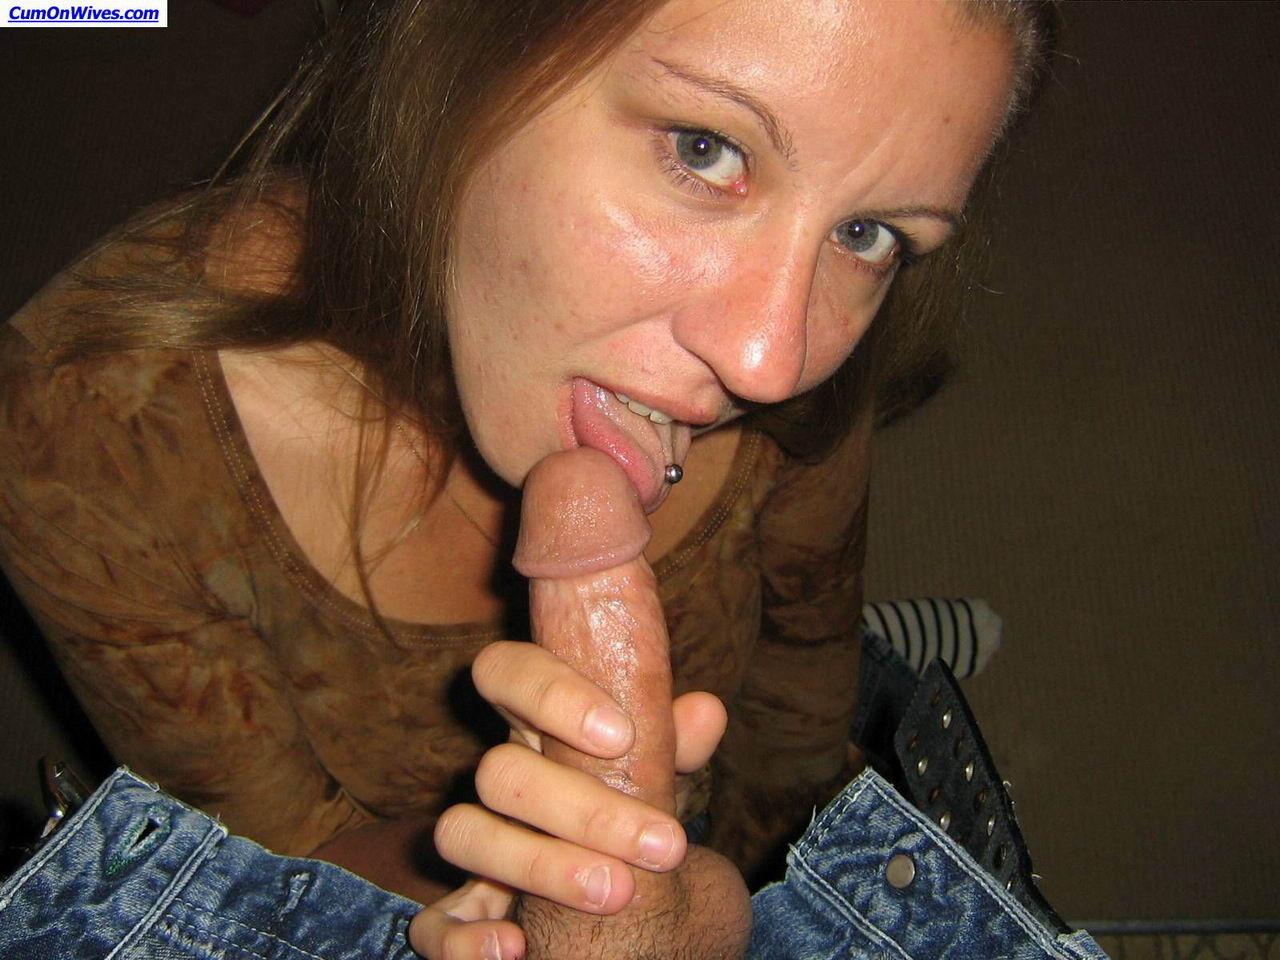 Hot amateur cumshot pics #68319680